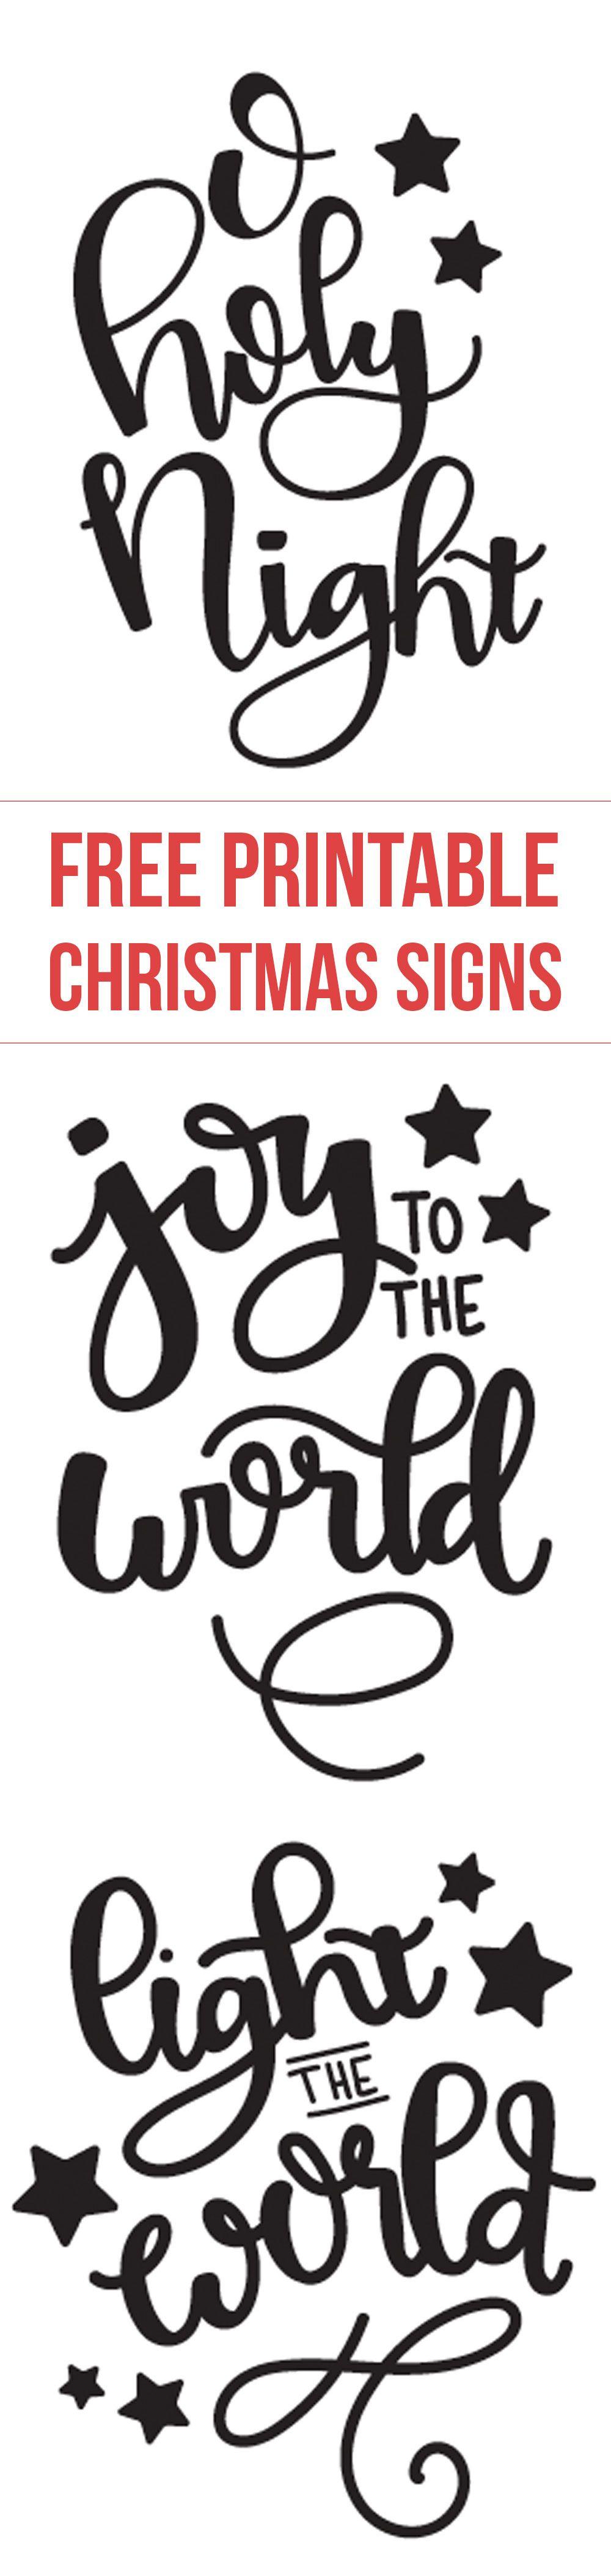 Light The World Designs | Live It. Love It. Lds. | Christmas - Free Printable Christmas Designs